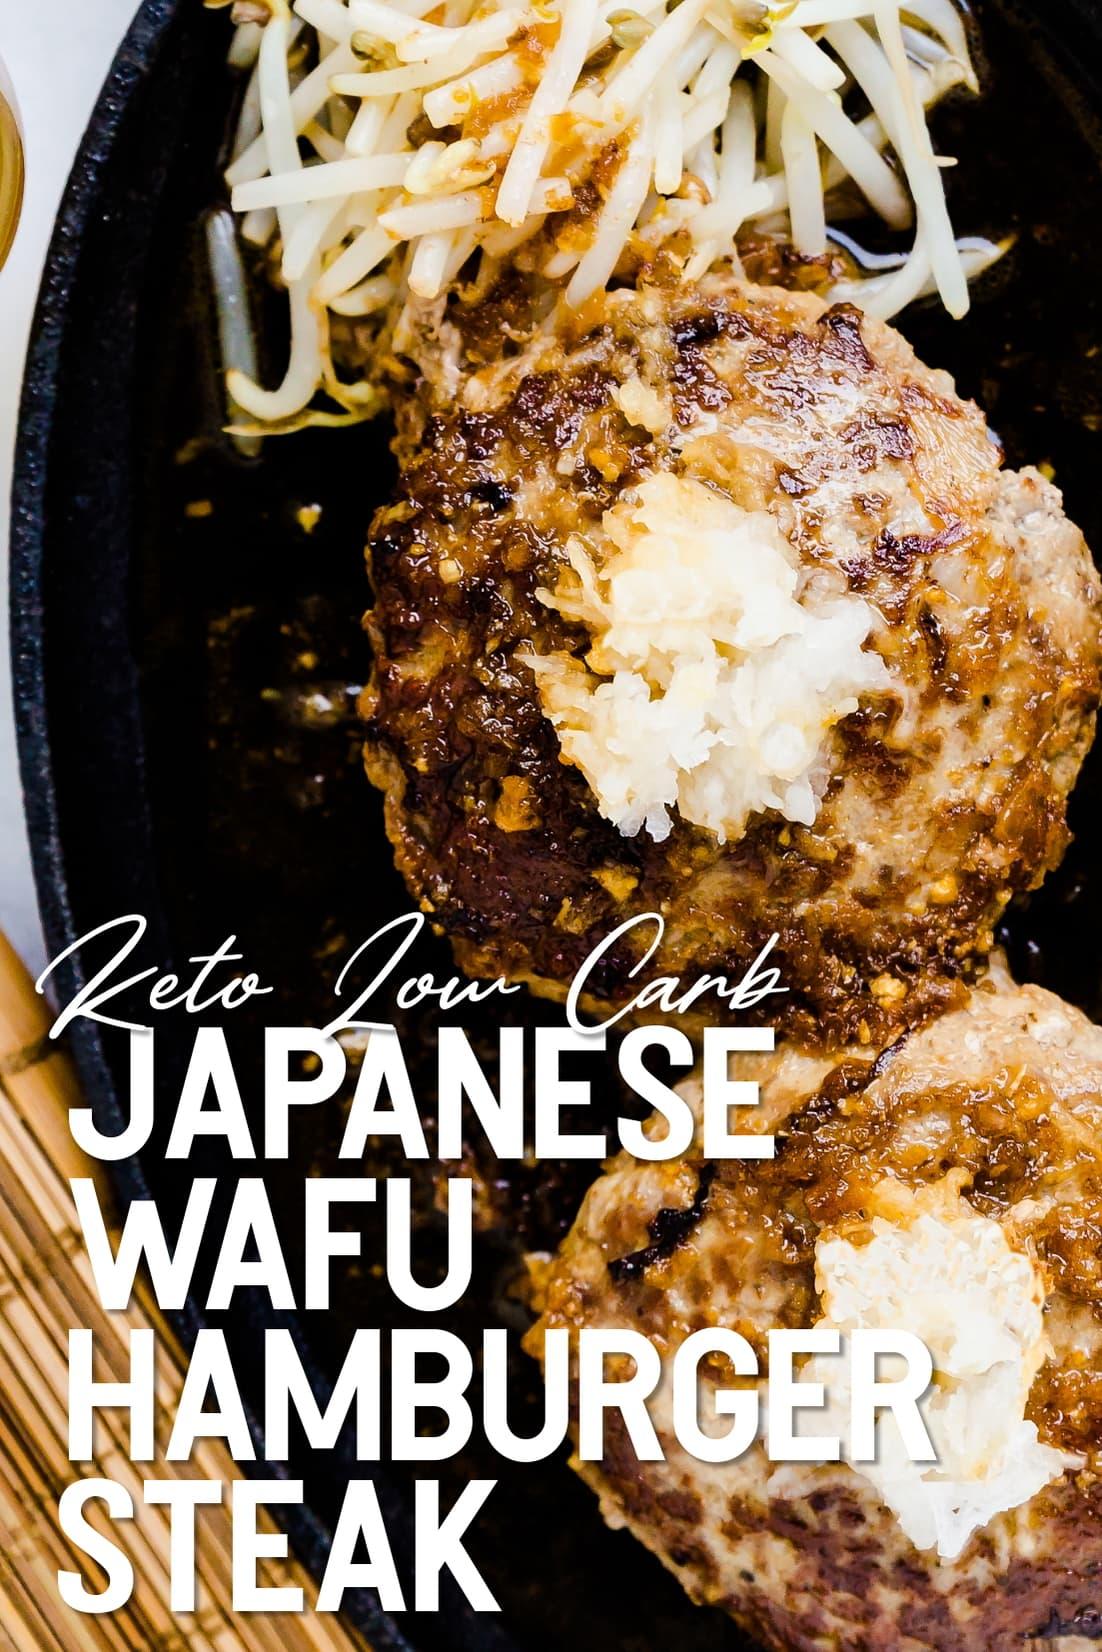 Japanese Wafu Hamburger Steak served on a teppan